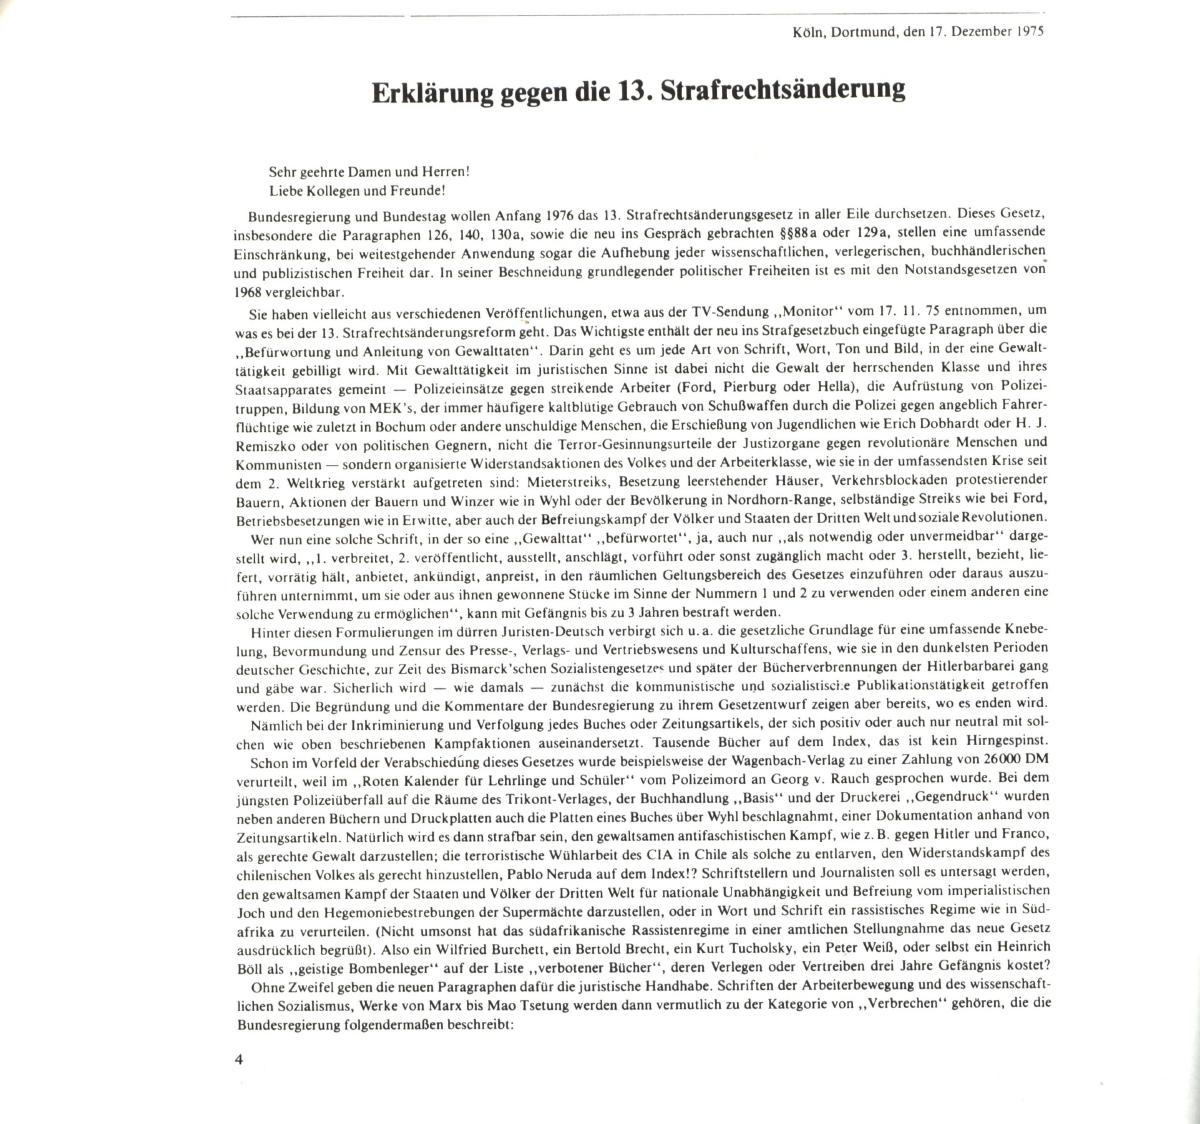 REP_VLB_1976_Die_Zensurgesetze_05